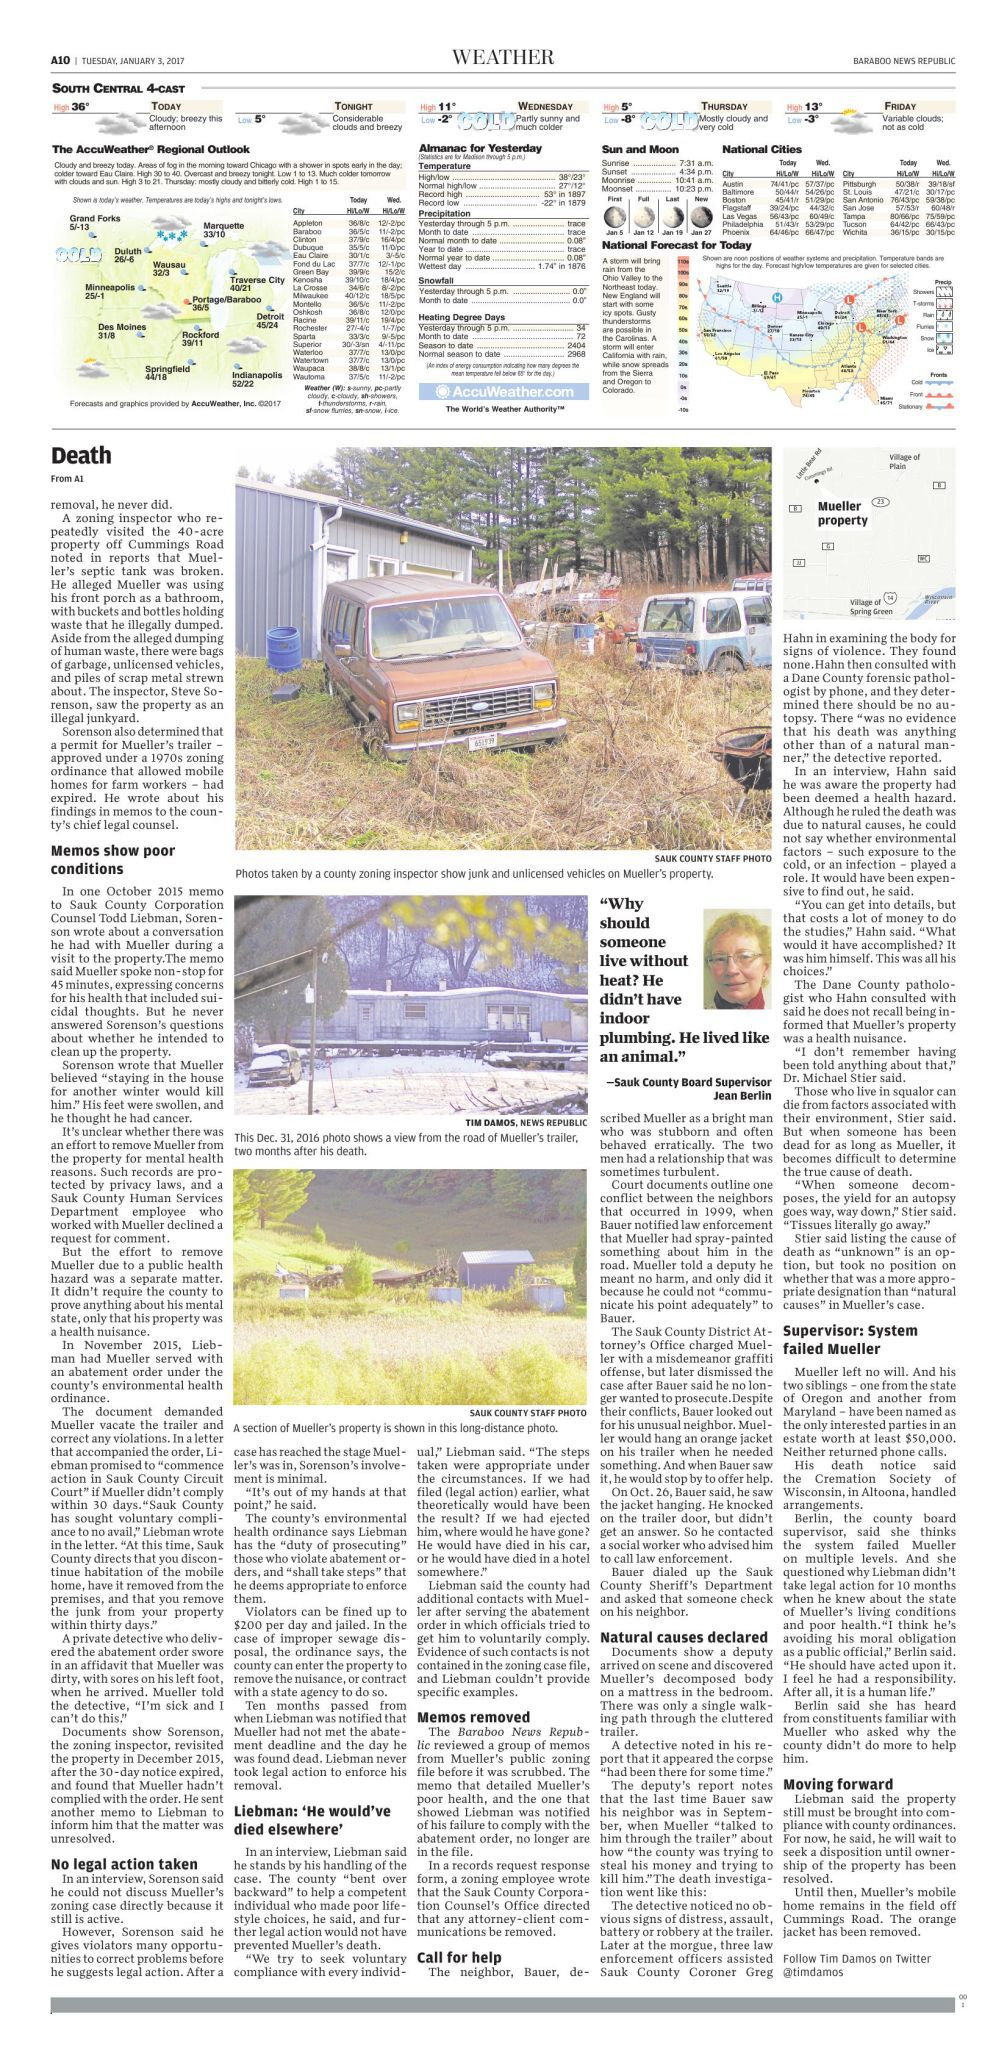 Sauk County man lived, died in environmental health hazard